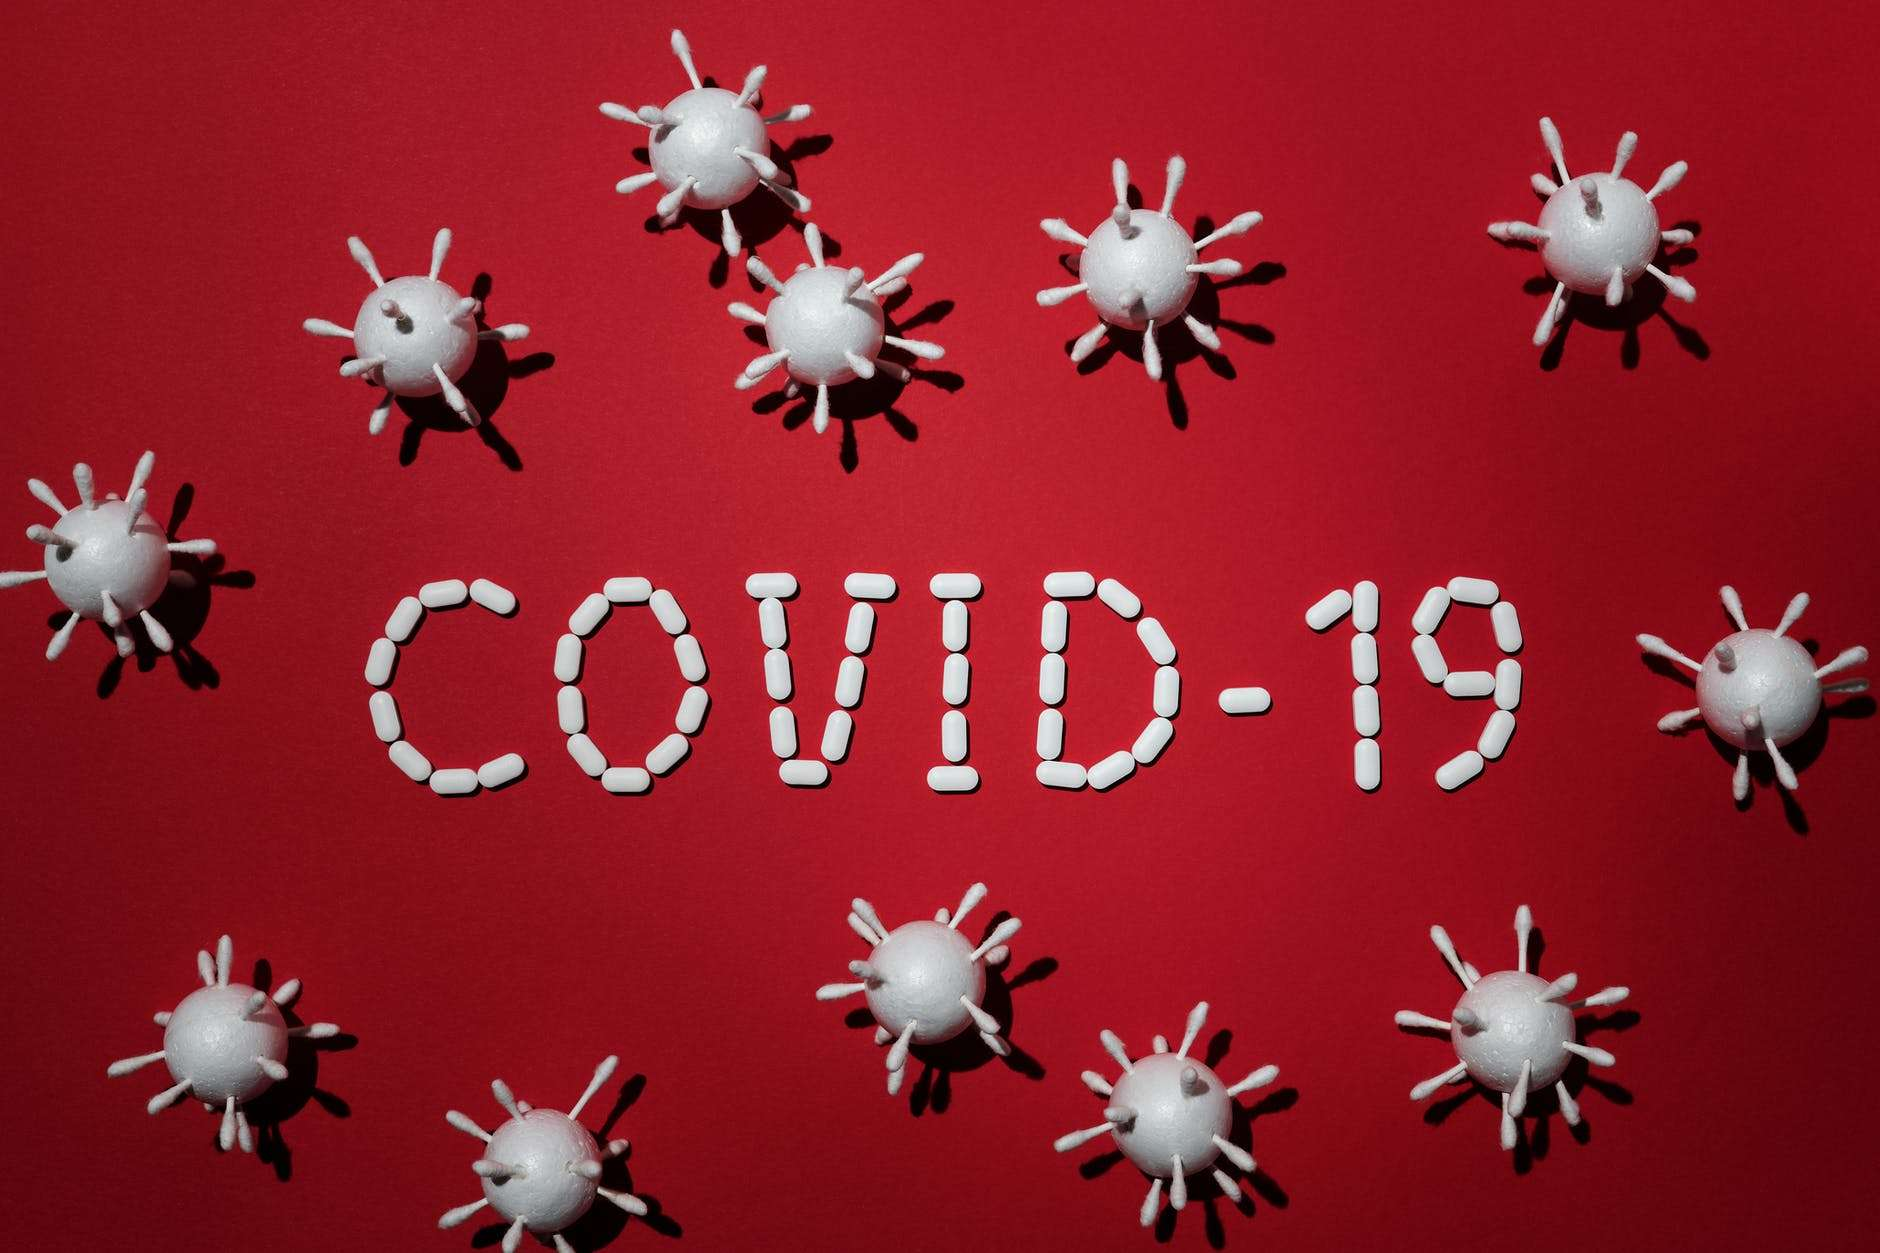 Study suggests coronavirus spread swiftly around world in late ...